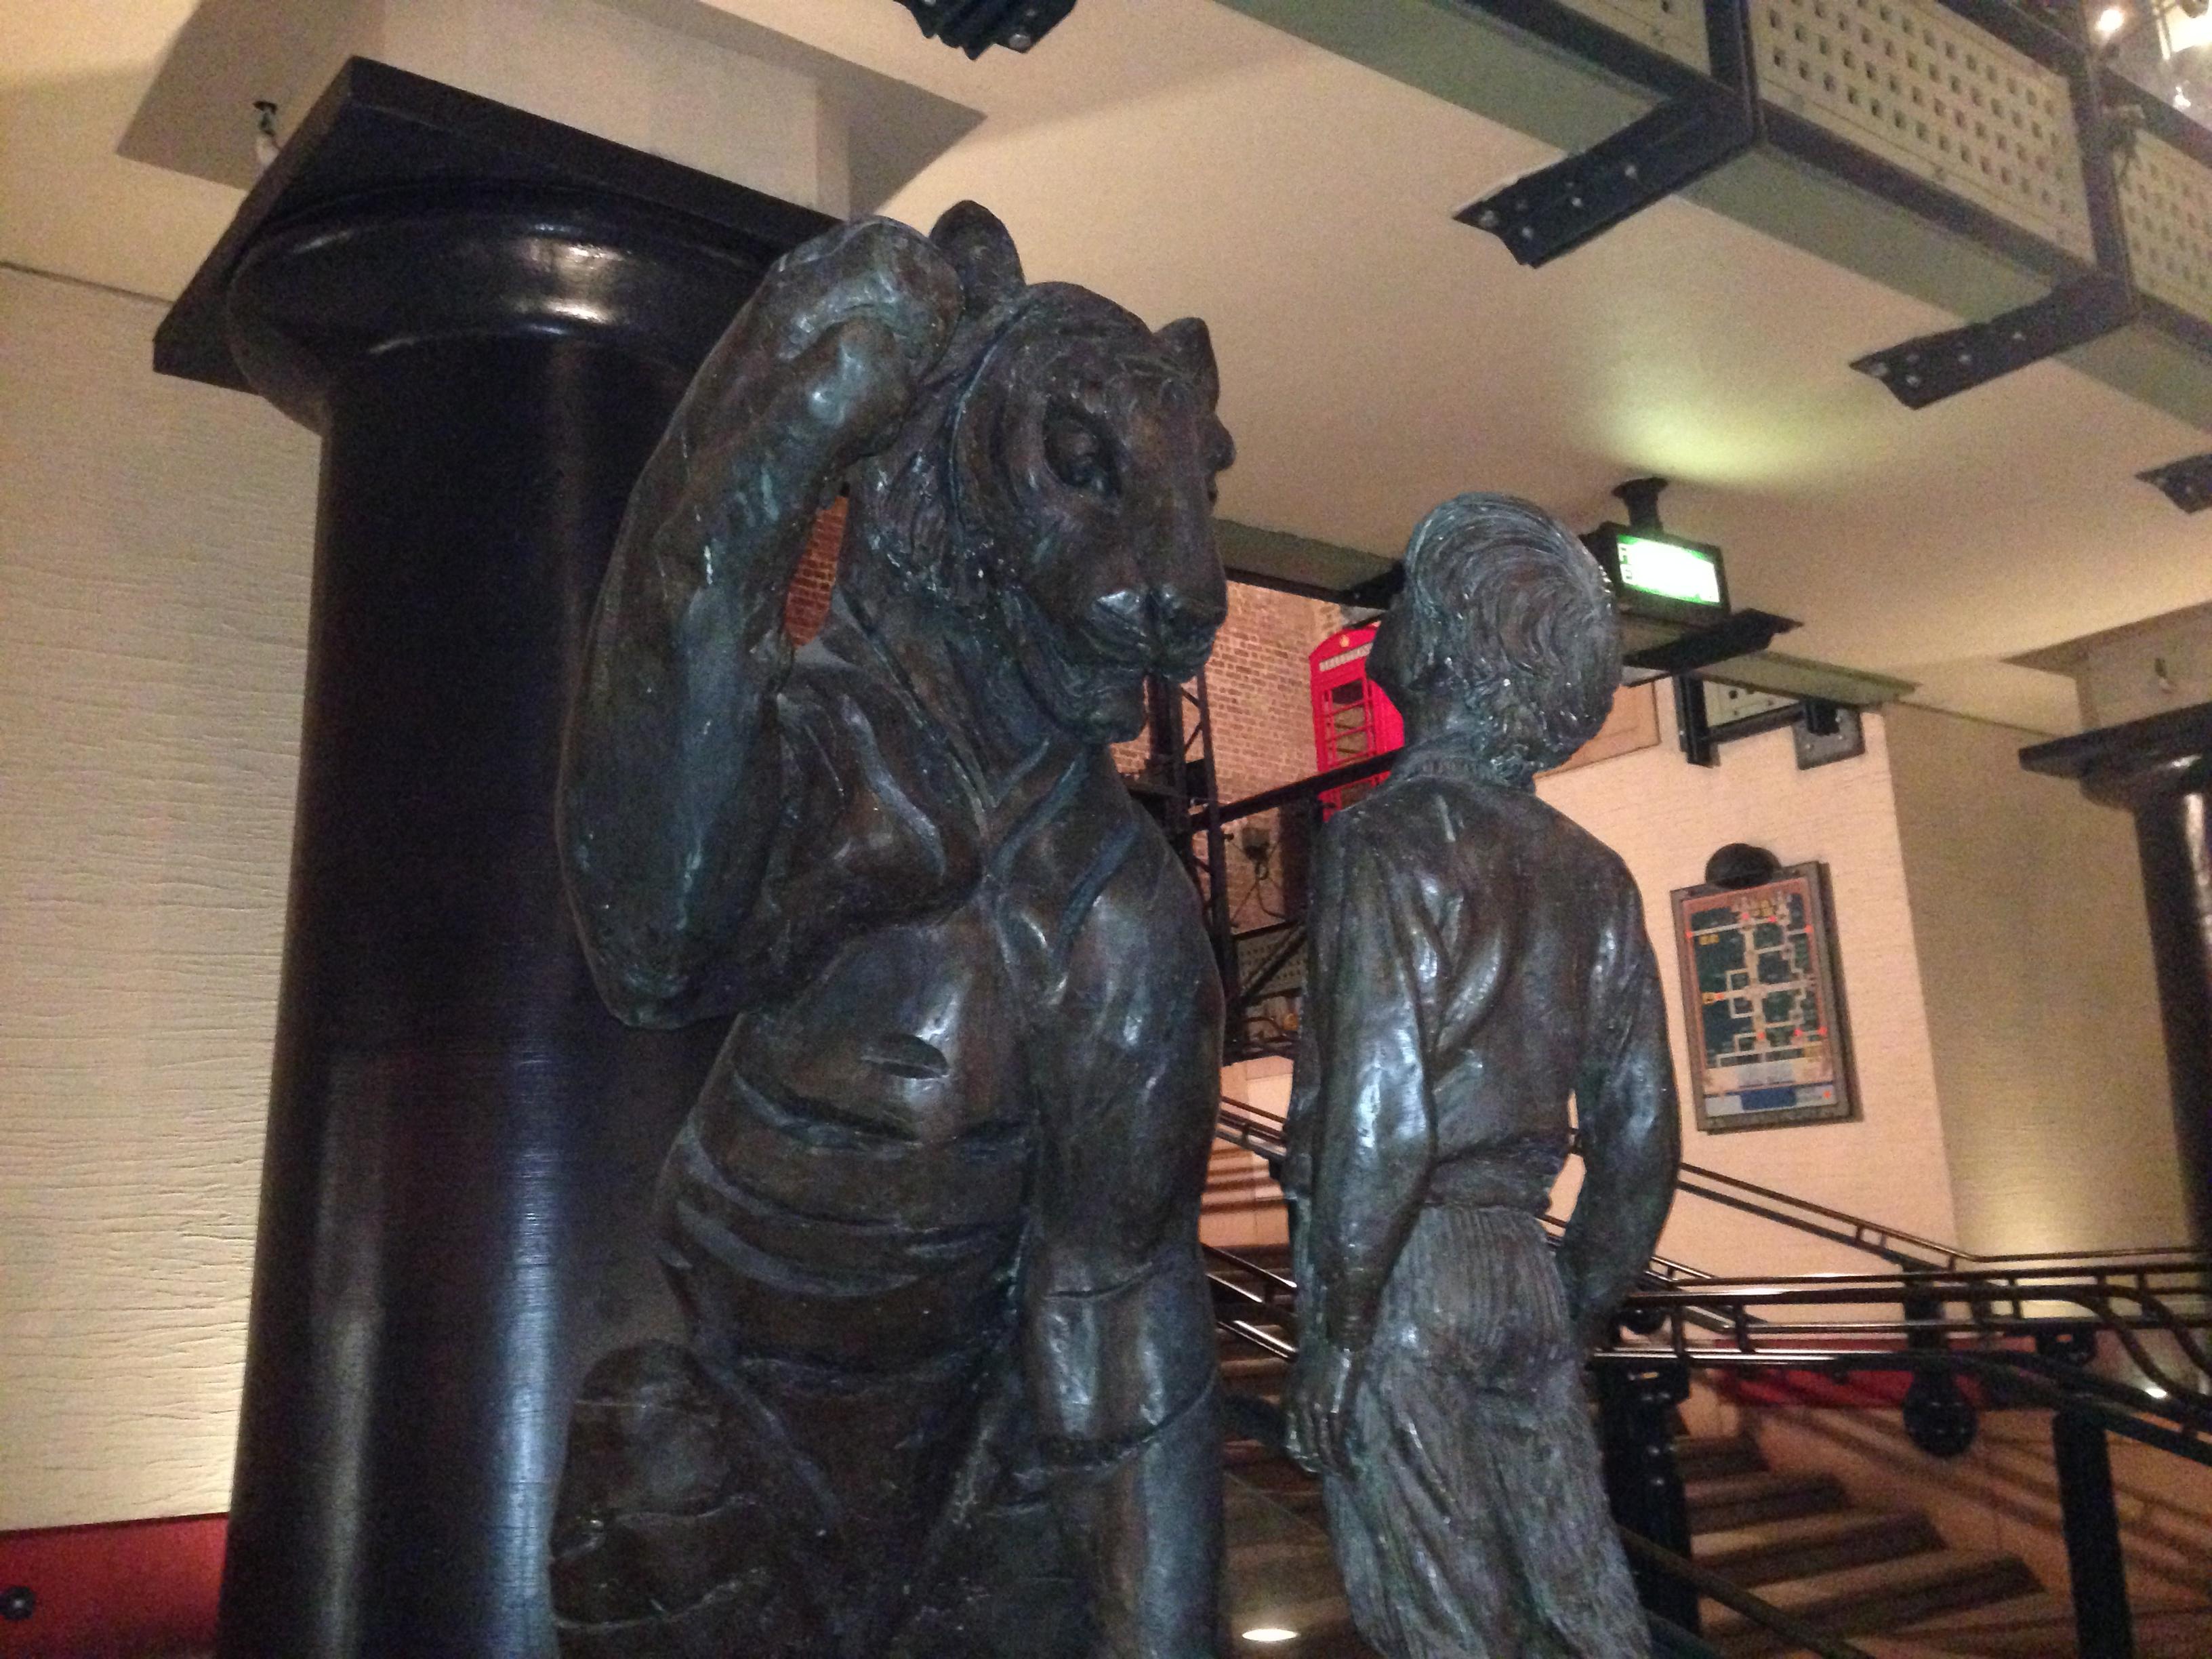 2014-03-12 23.52.31 BAFTAs - statue